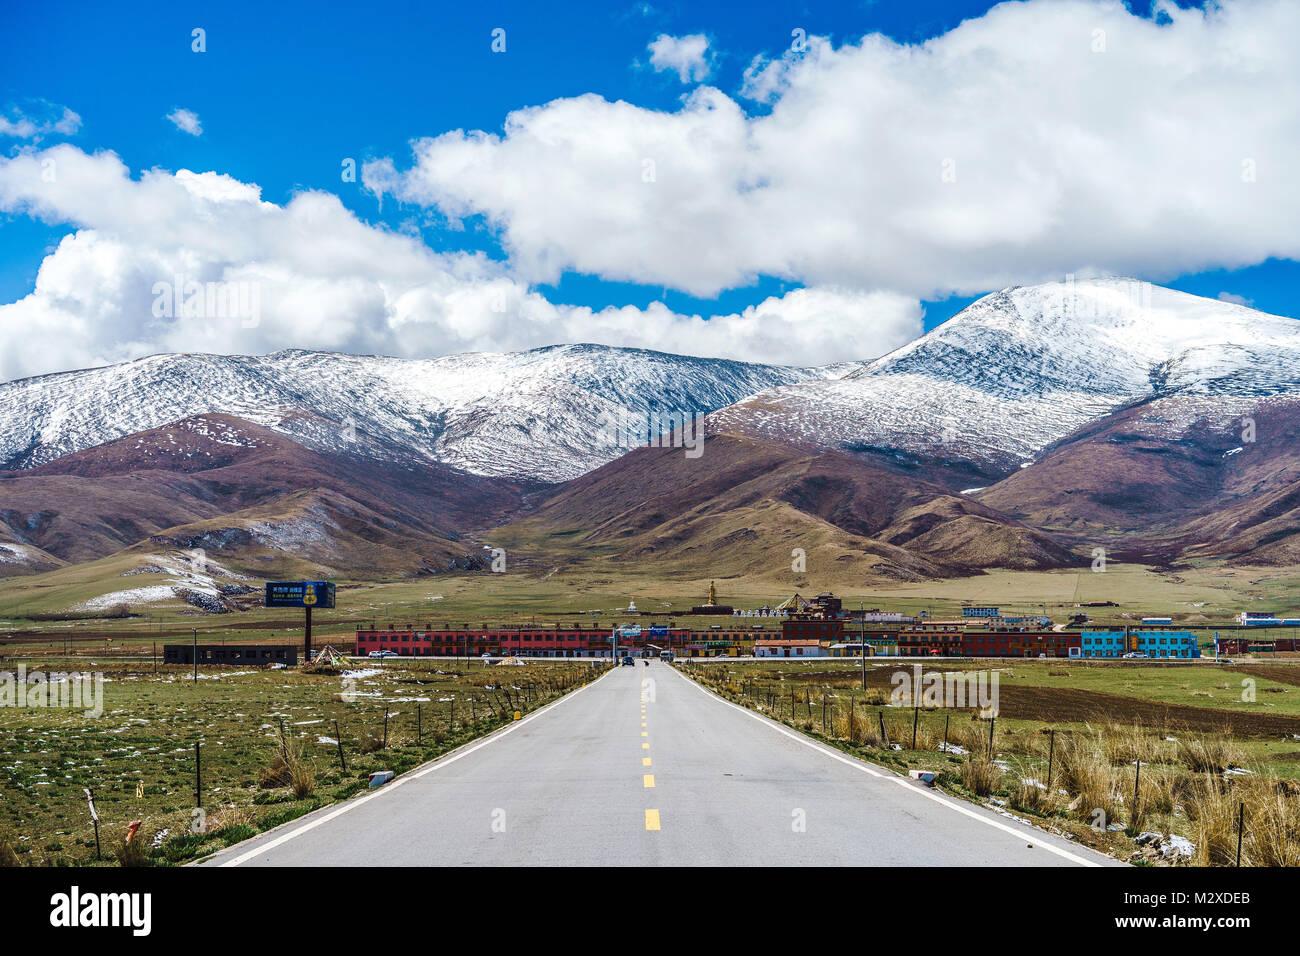 Qinghai Lake highway, Qinghai Province - Stock Image